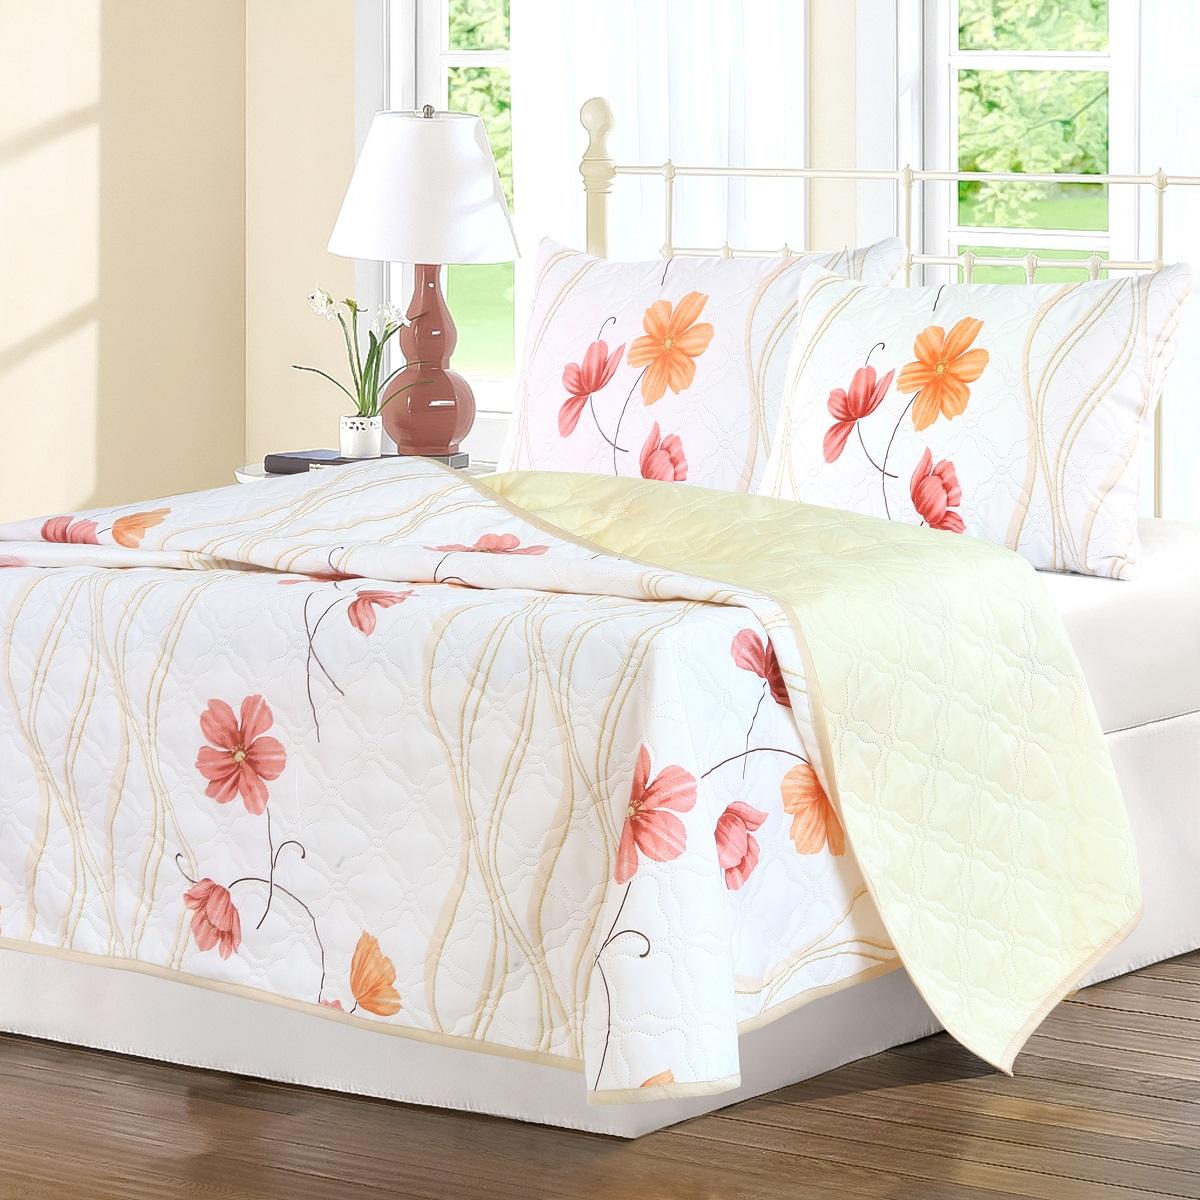 Покрывало Modalin Покрывало Zana (220х240 см) modalin modalin полотенце petek цвет розовый 70х140 см